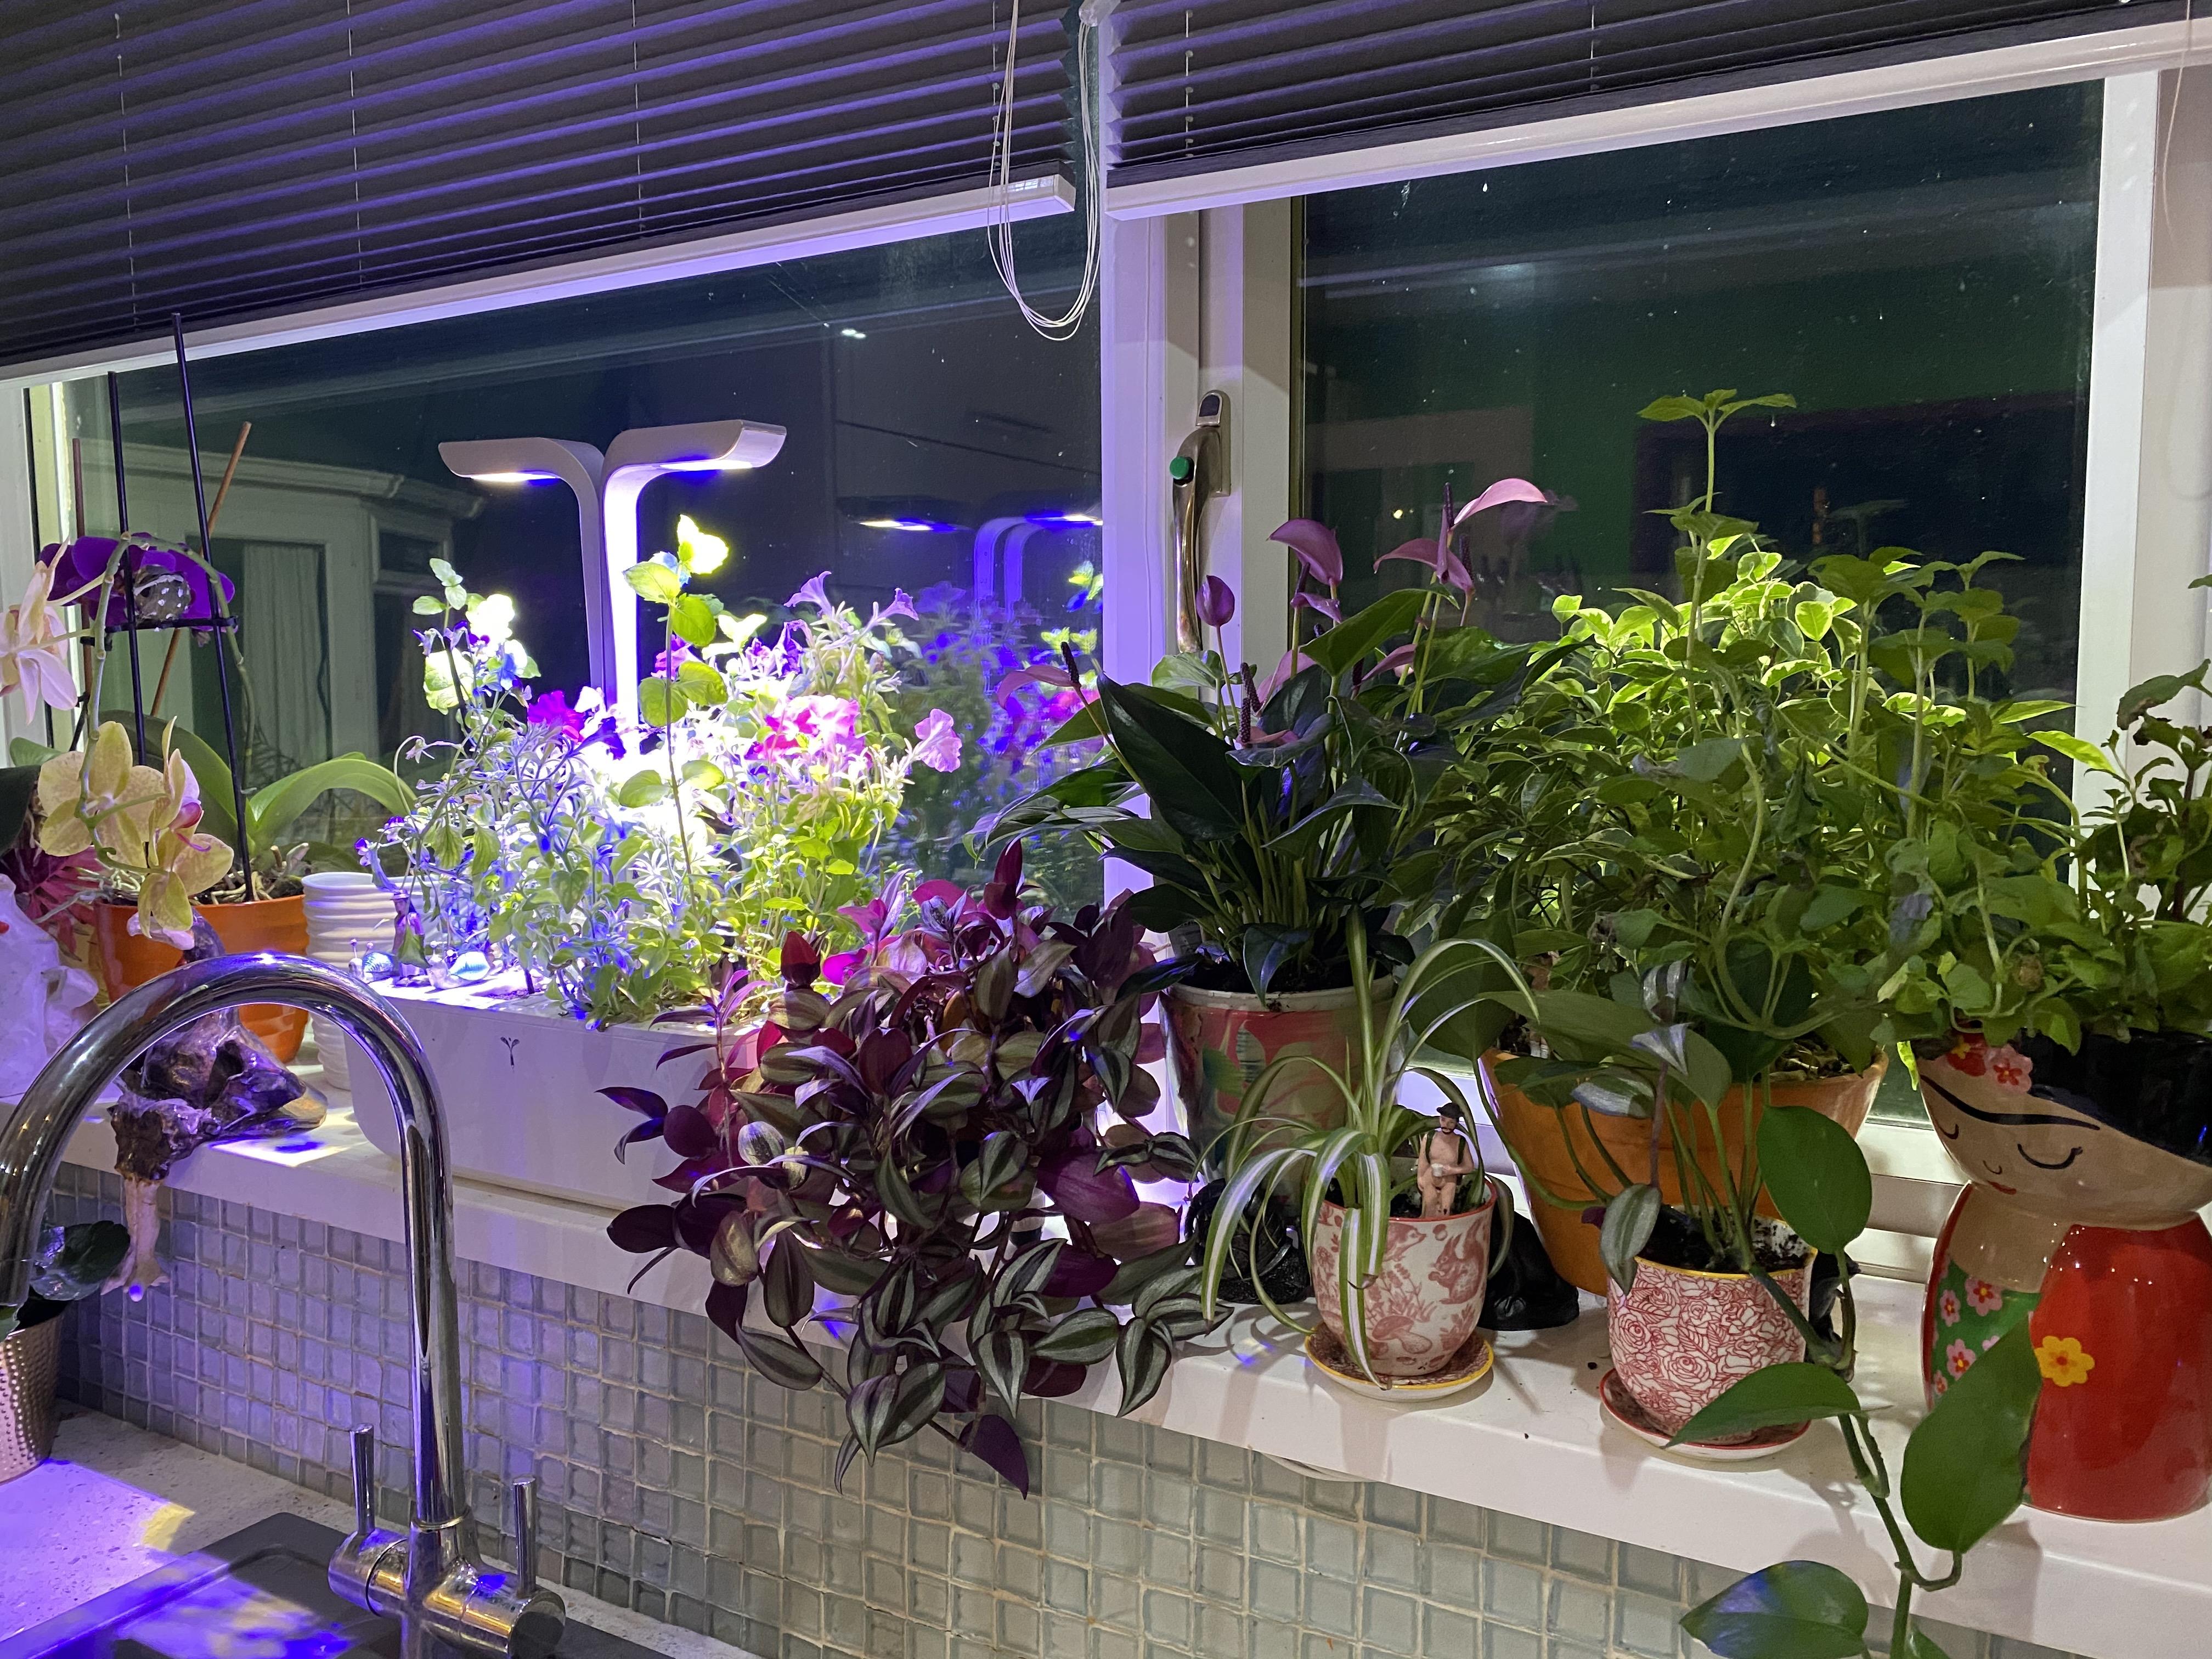 Above: The green shoots on Rosie's kitchen sill garden!